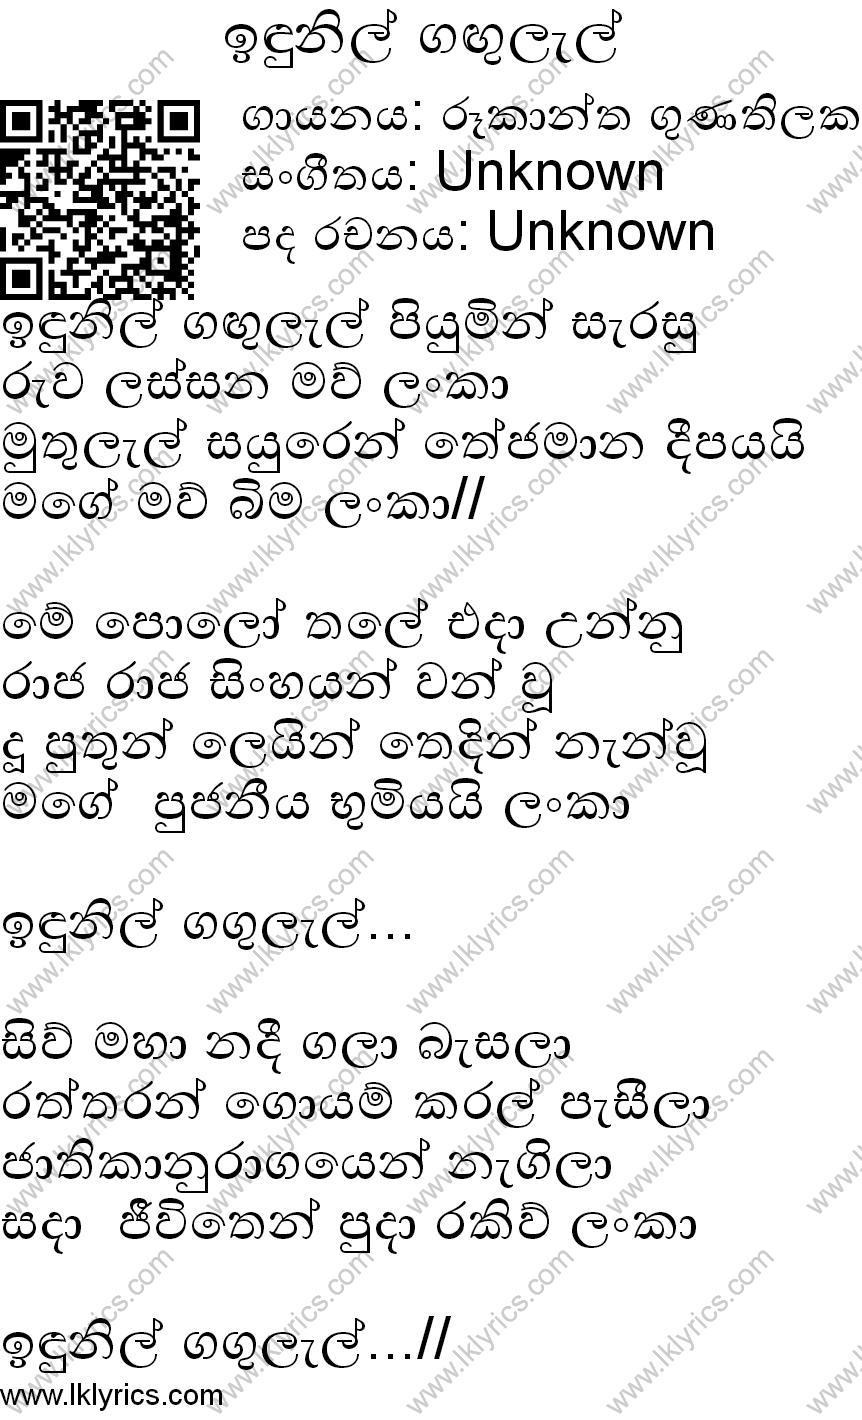 Ma Saara Bhoomi Lanka මා සාර භූමි ලංකා (මුල් …